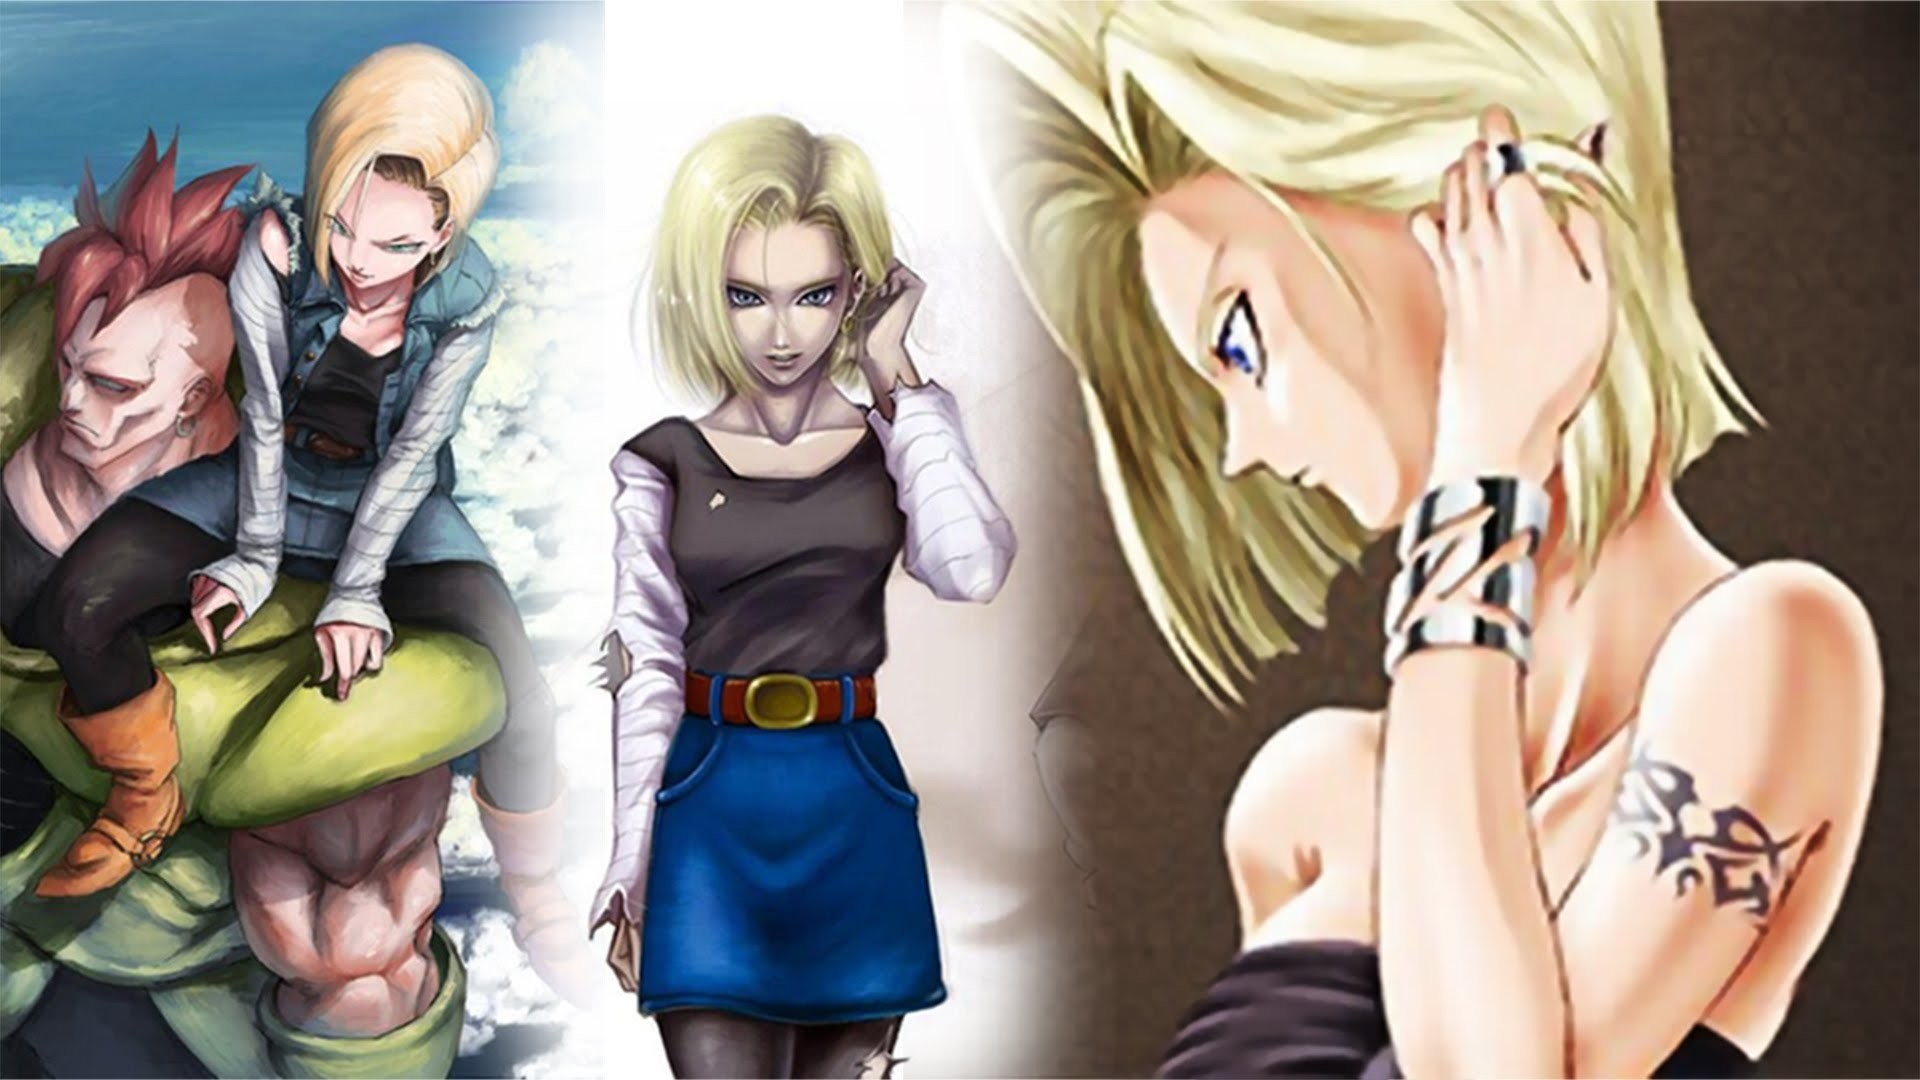 Los Mejores Fondos De Pantalla En HD De Dragon Ball Z – Taringa!